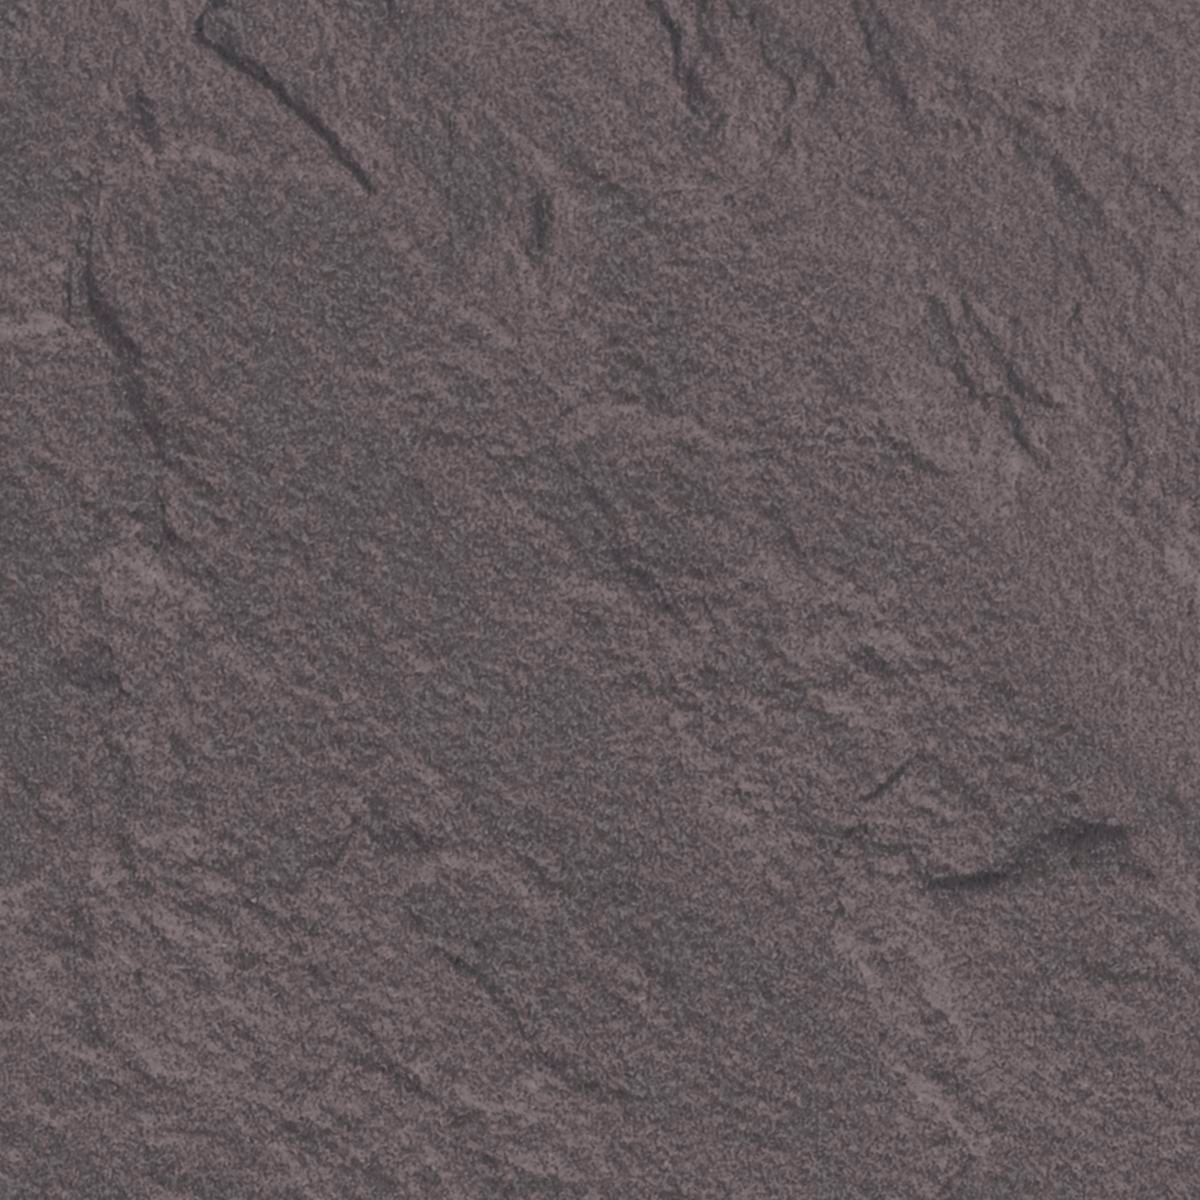 Plan De Travail Laminé plan de travail stratifié ardoise gris moyen r6448 vv 4100x650x38mm profil  quadra